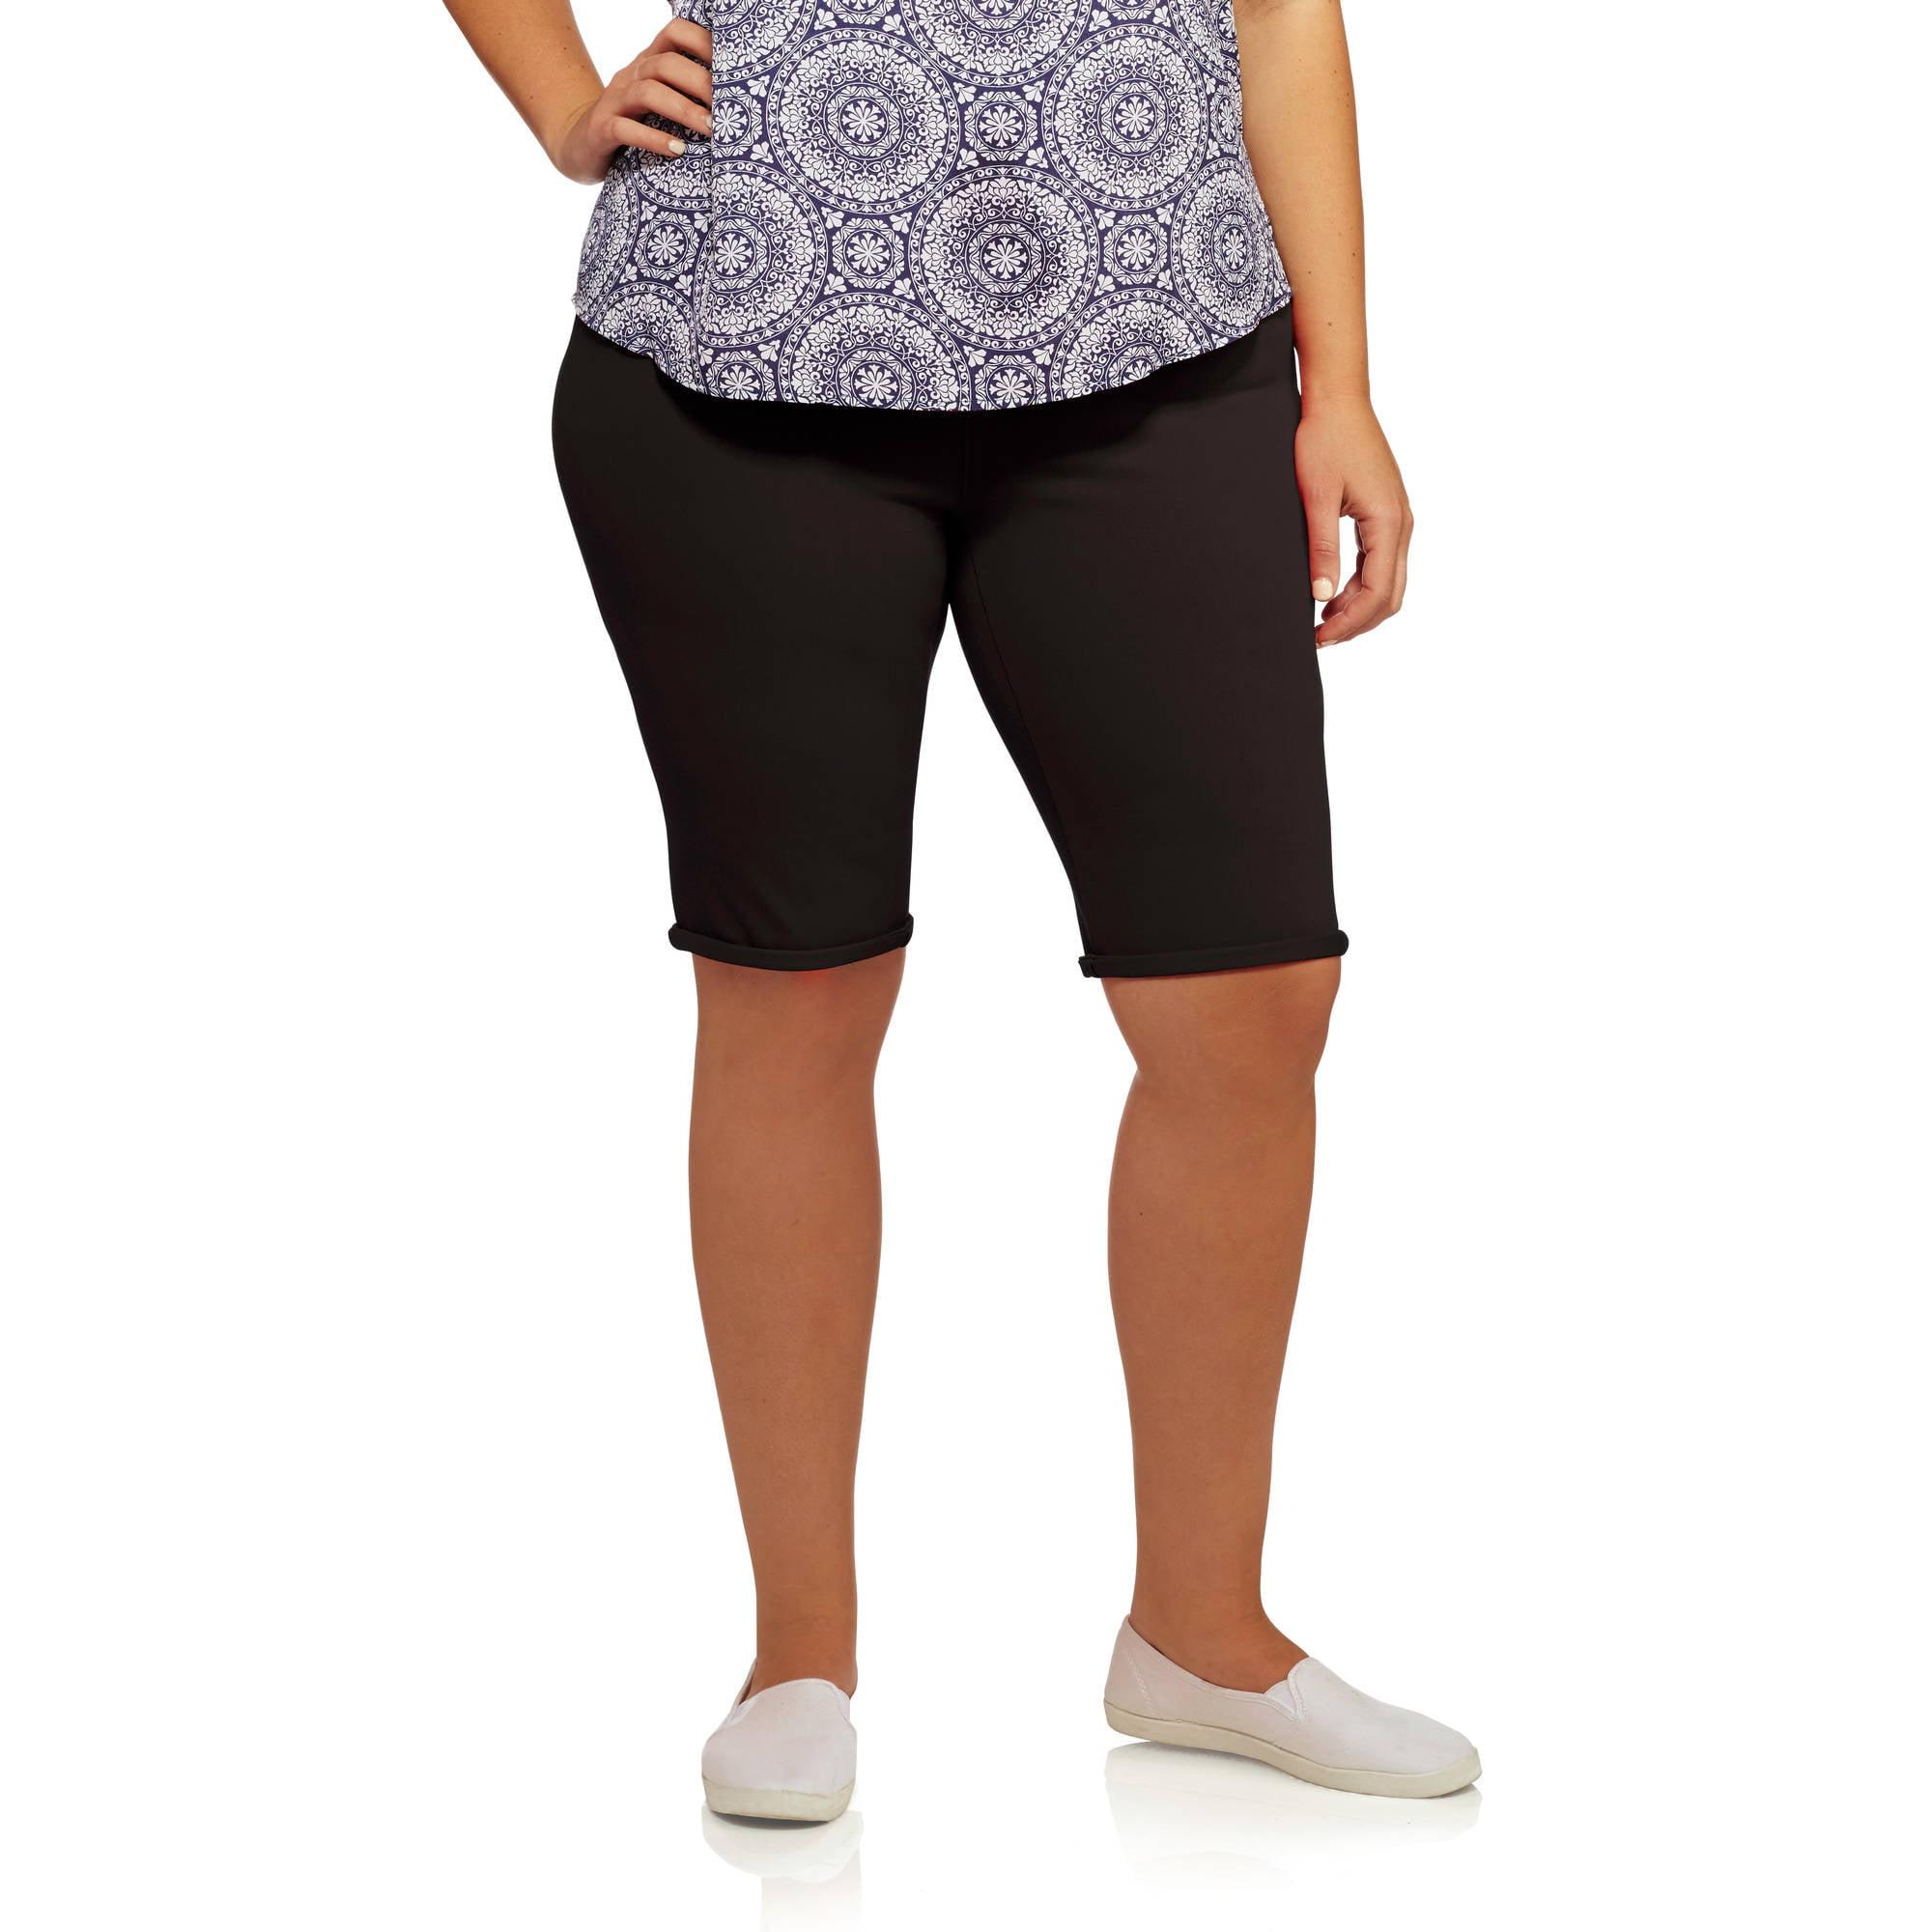 Plus Size Bermuda Shorts